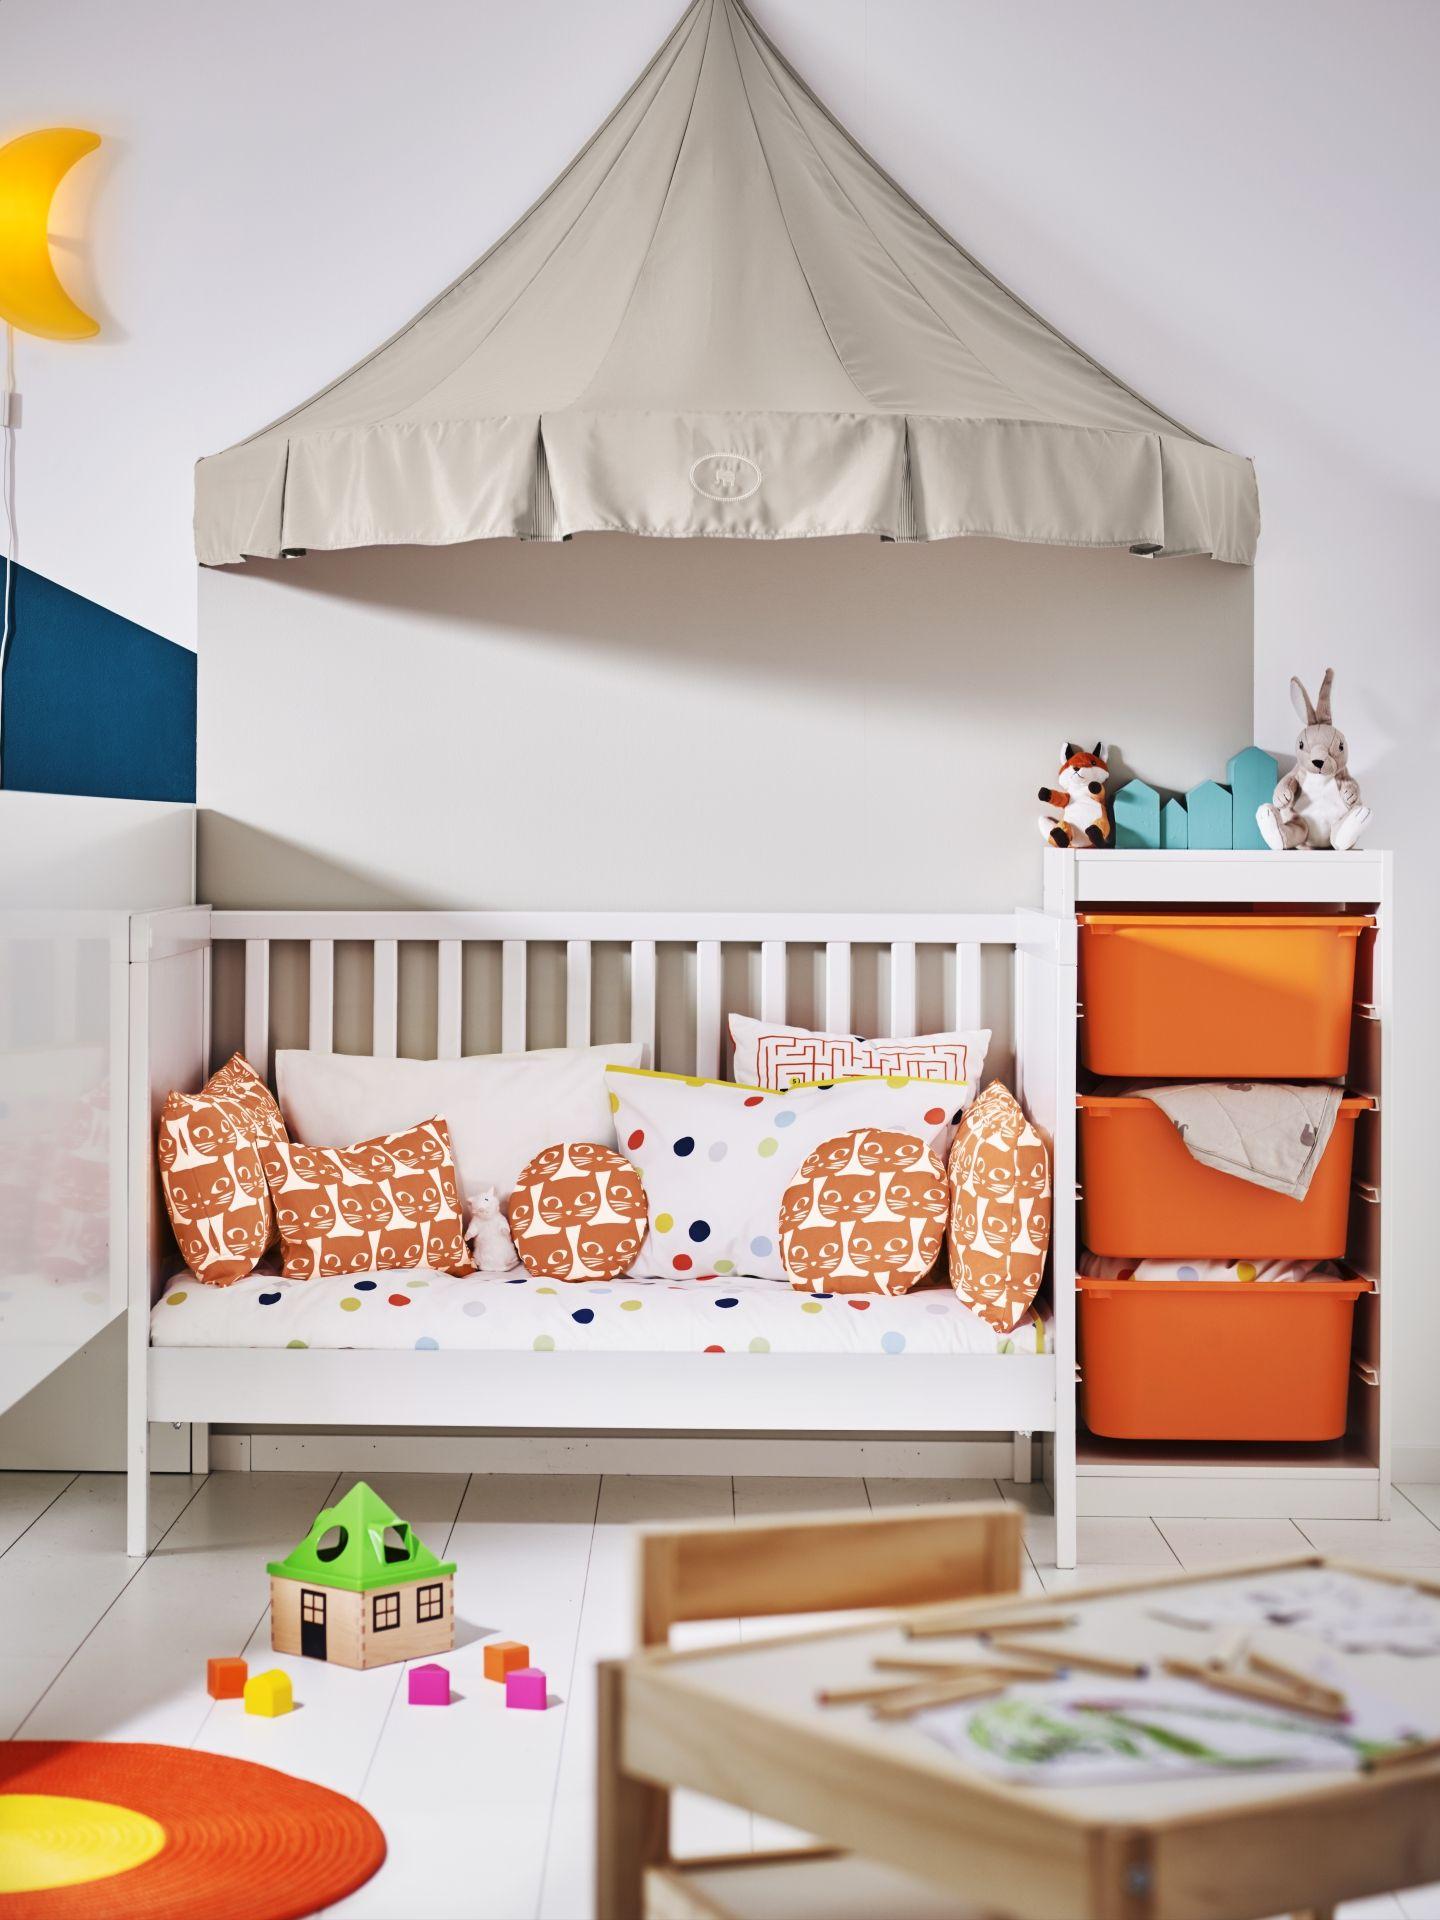 CHARMTROLL bedhemel | #IKEAcatalogus #nieuw #2017 #IKEA #IKEAnl #bed ...